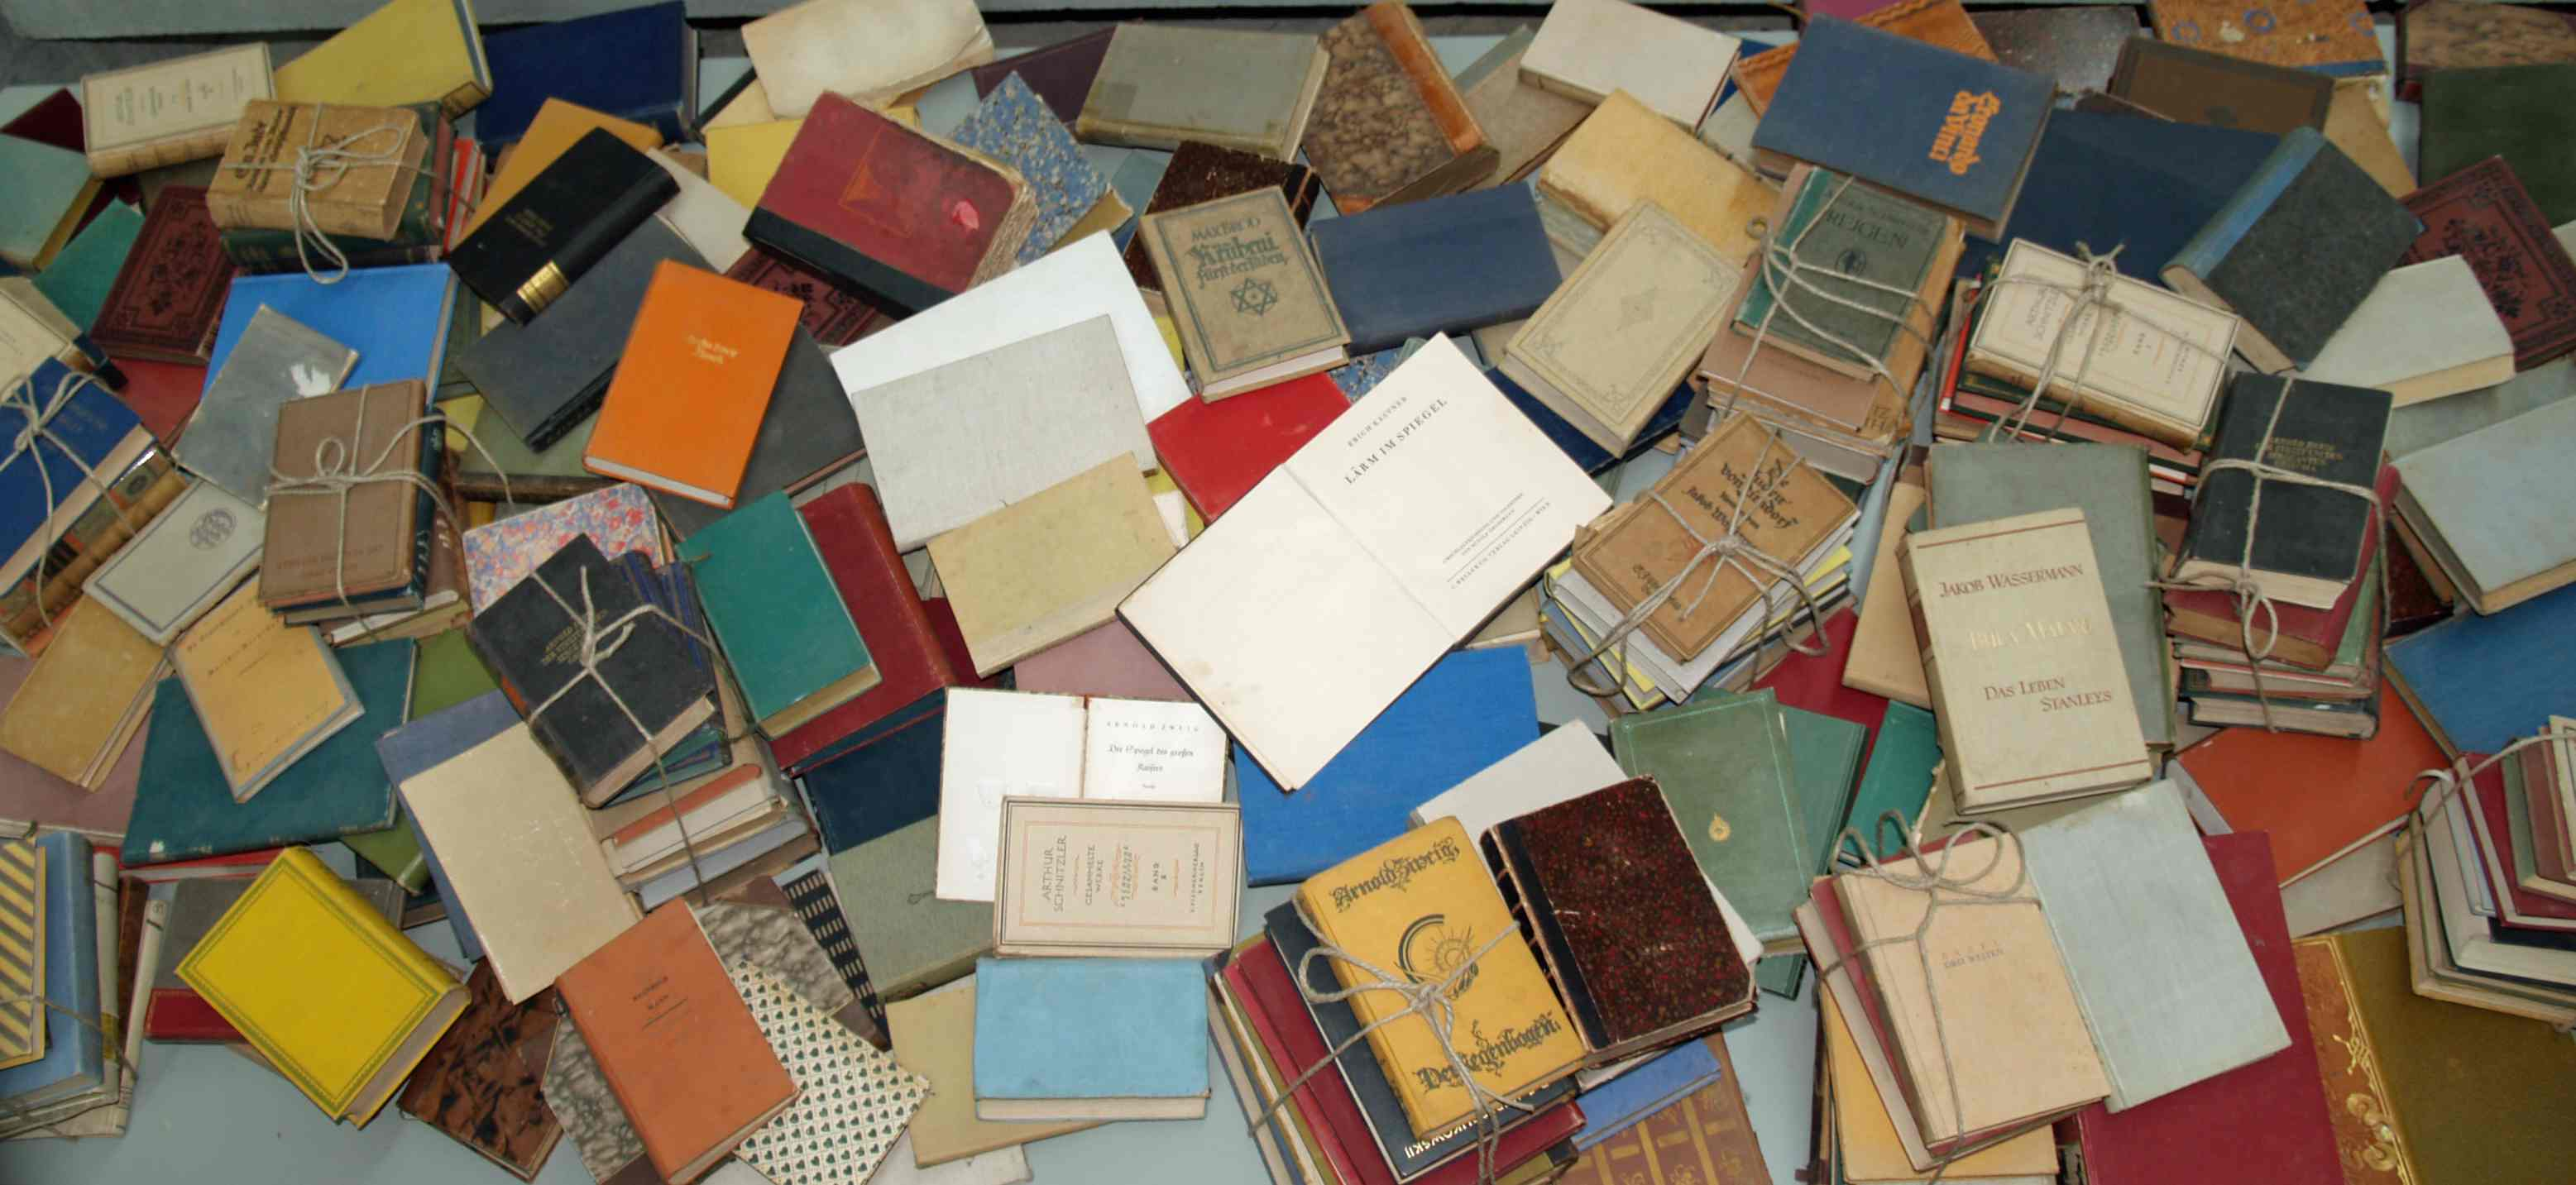 Yad_Vashem_Books_burned_by_Nazis_by_David_Shankbone